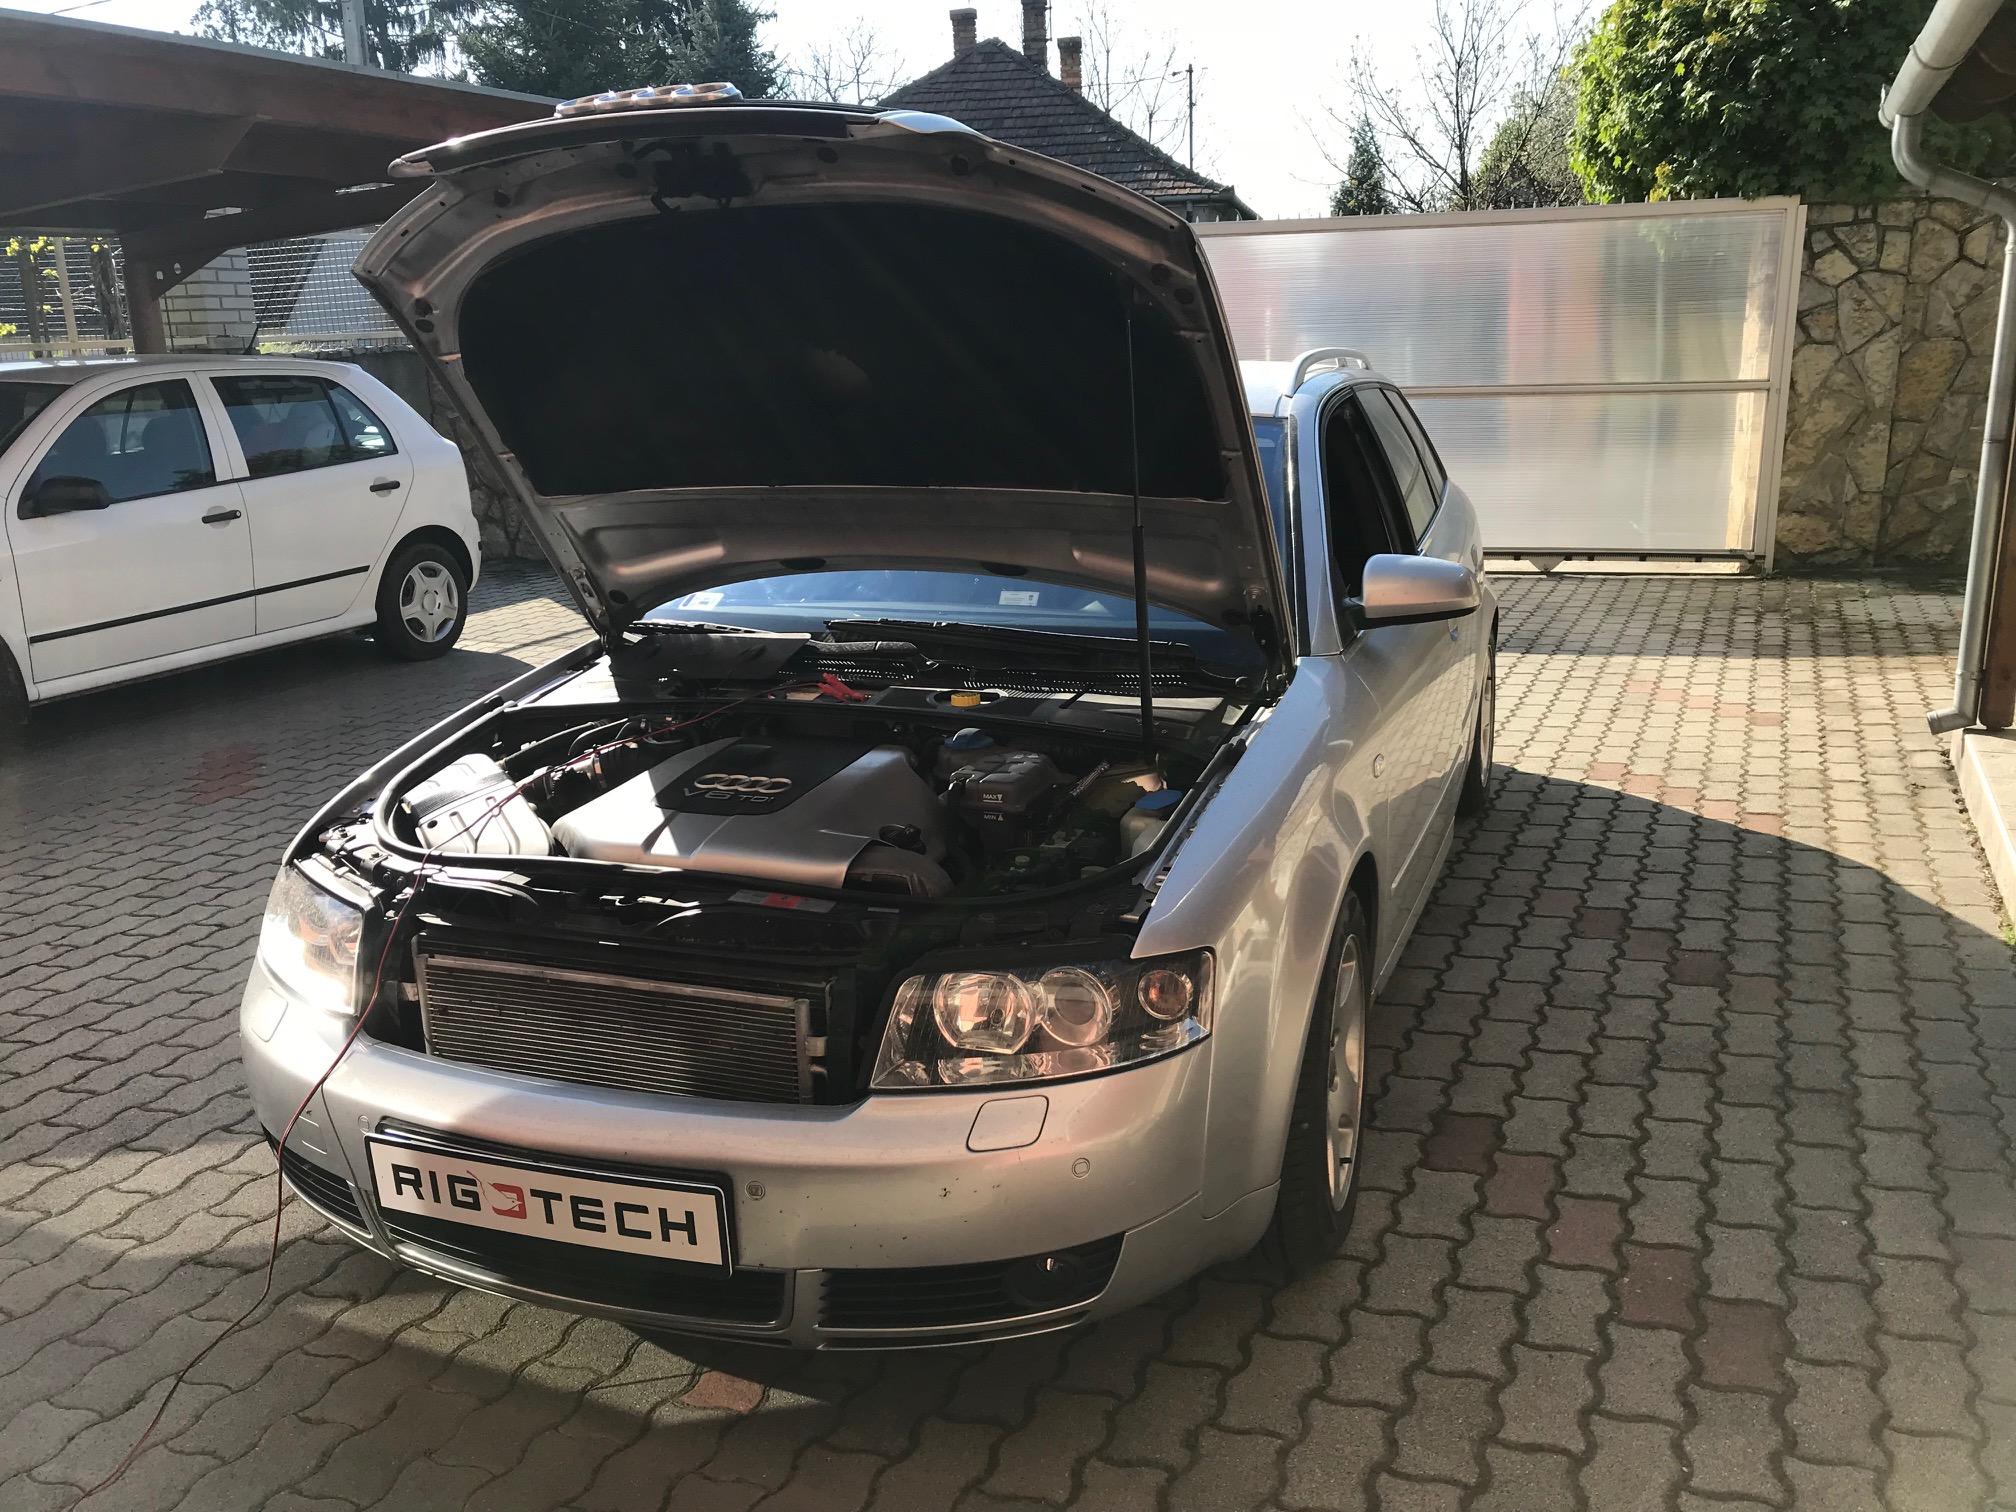 Audi-A4-25v6-tdi-180Le-Chiptuning